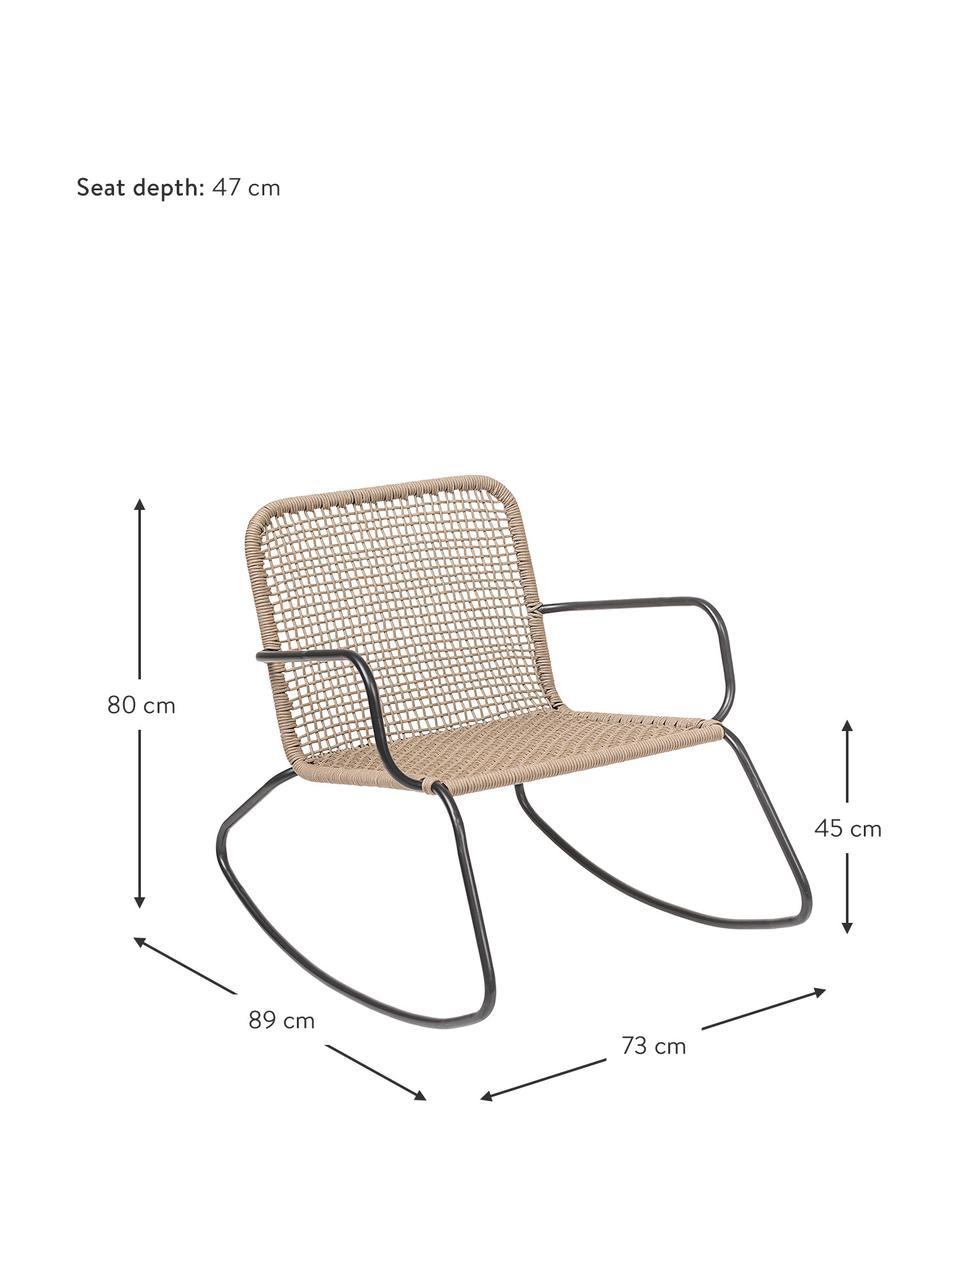 Rattan-Schaukelstuhl Mundo mit Metall-Gestell, Gestell: Metall, pulverbeschichtet, Sitzfläche: Polyethylen, Beige, B 73 x T 89 cm